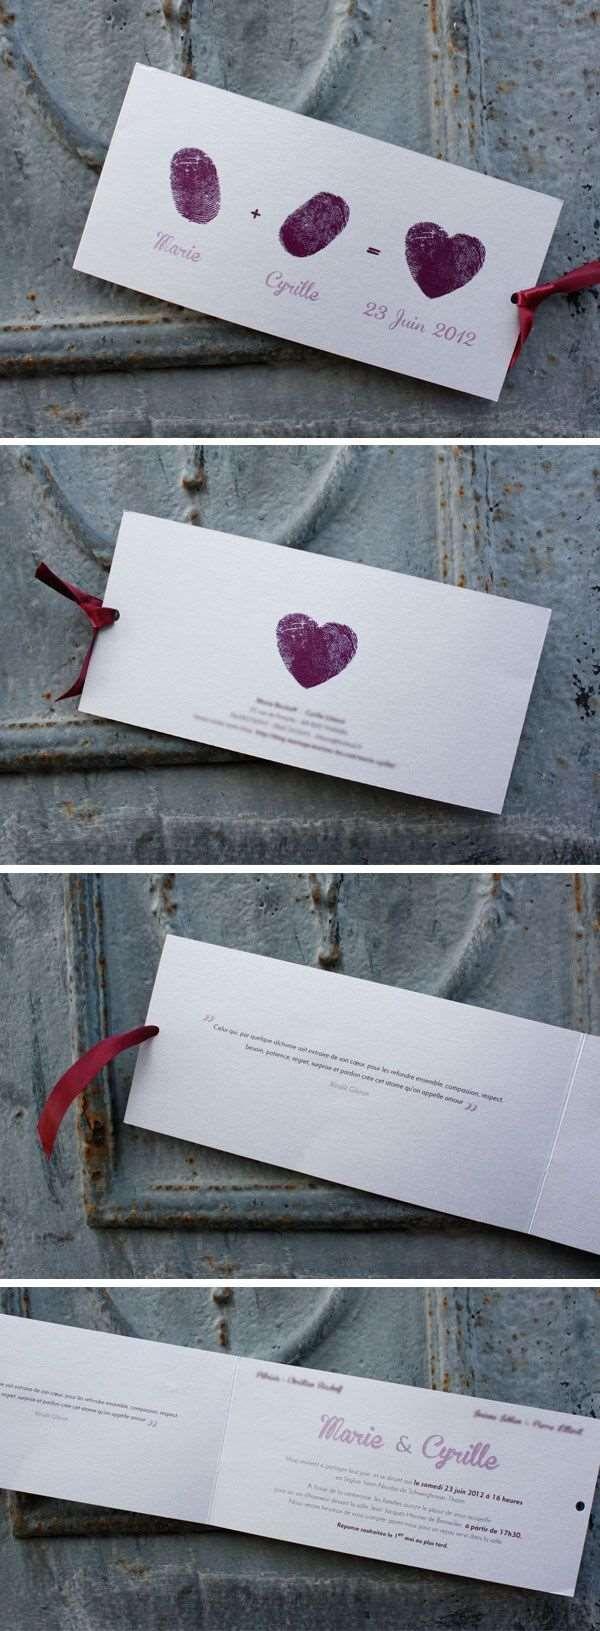 convite romântico de casamento                                                                                                                                                                                 Mais